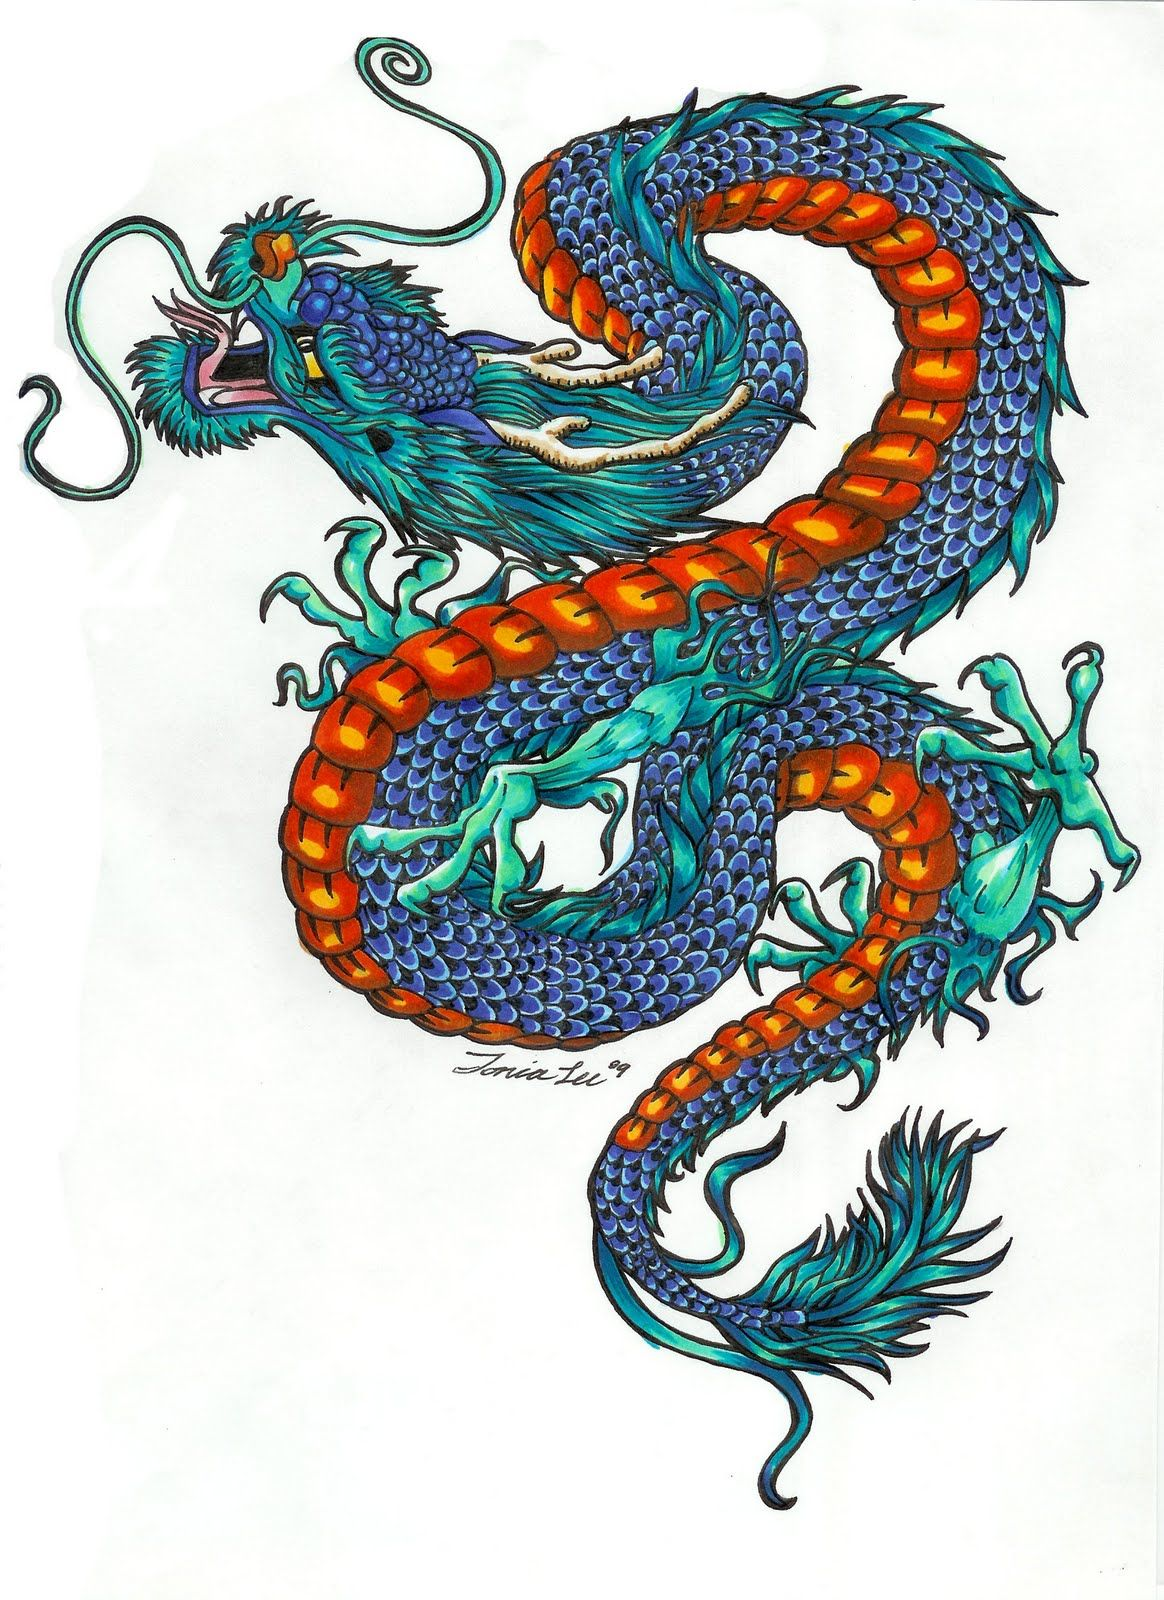 Pin By James Cheung On Dragon Dragon Tattoo Designs Dragon Artwork Dragon Tattoo